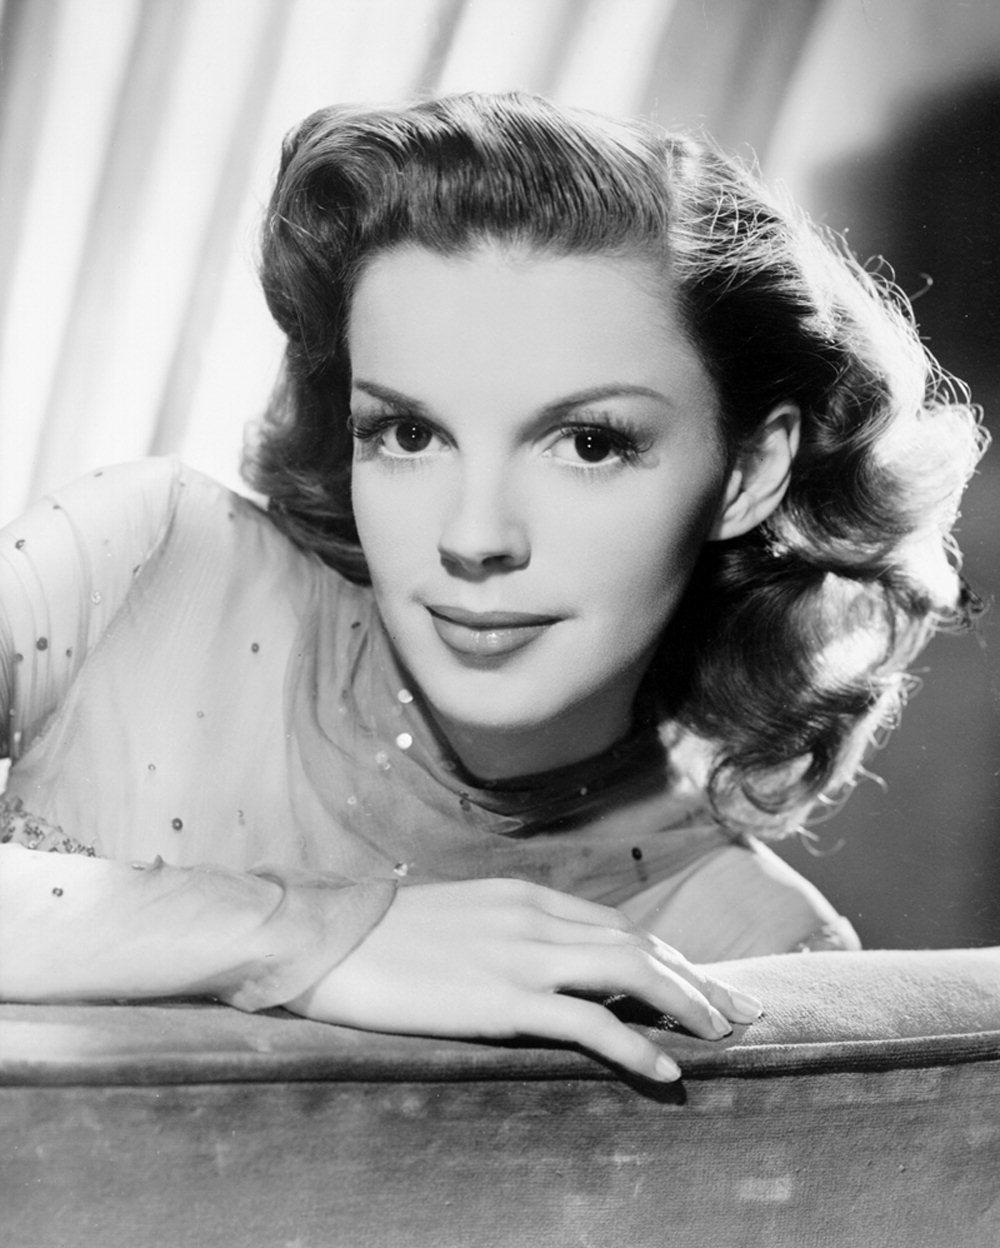 Photo Judy Garland via Opendata BNF